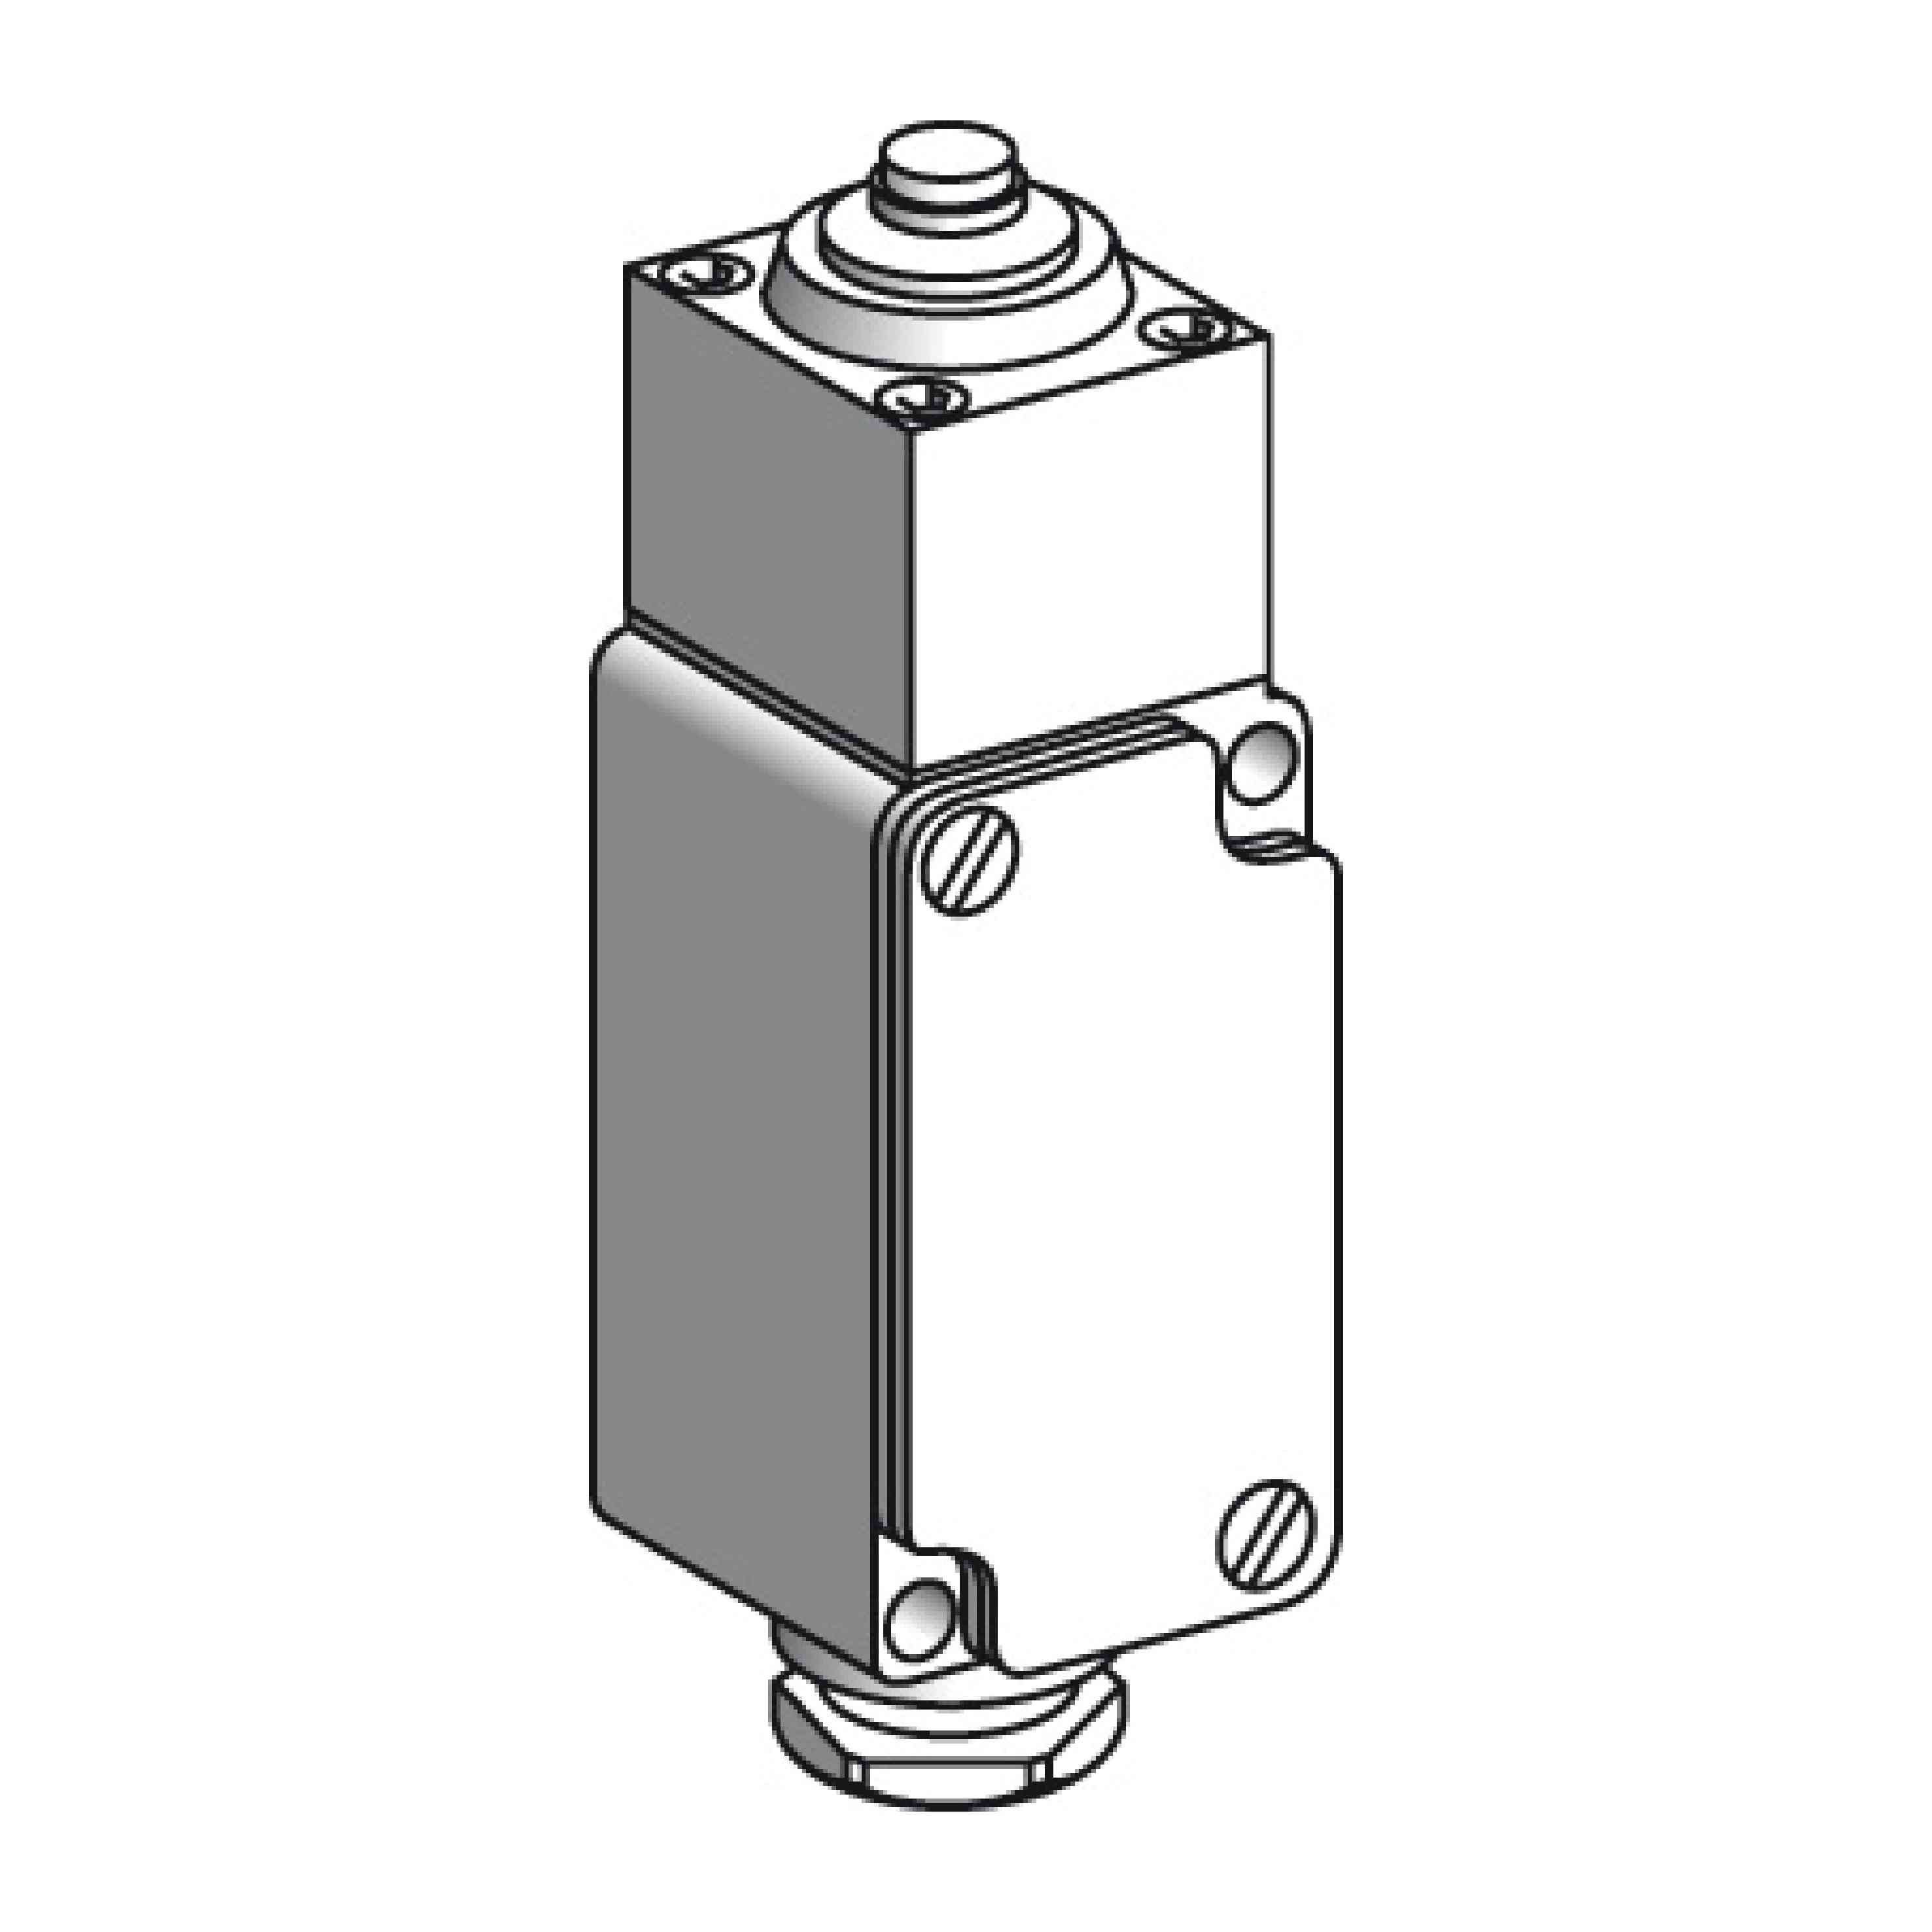 Omejitveno stikalo XC2-J - bat s kovinskim zaključkom - 1 C/O